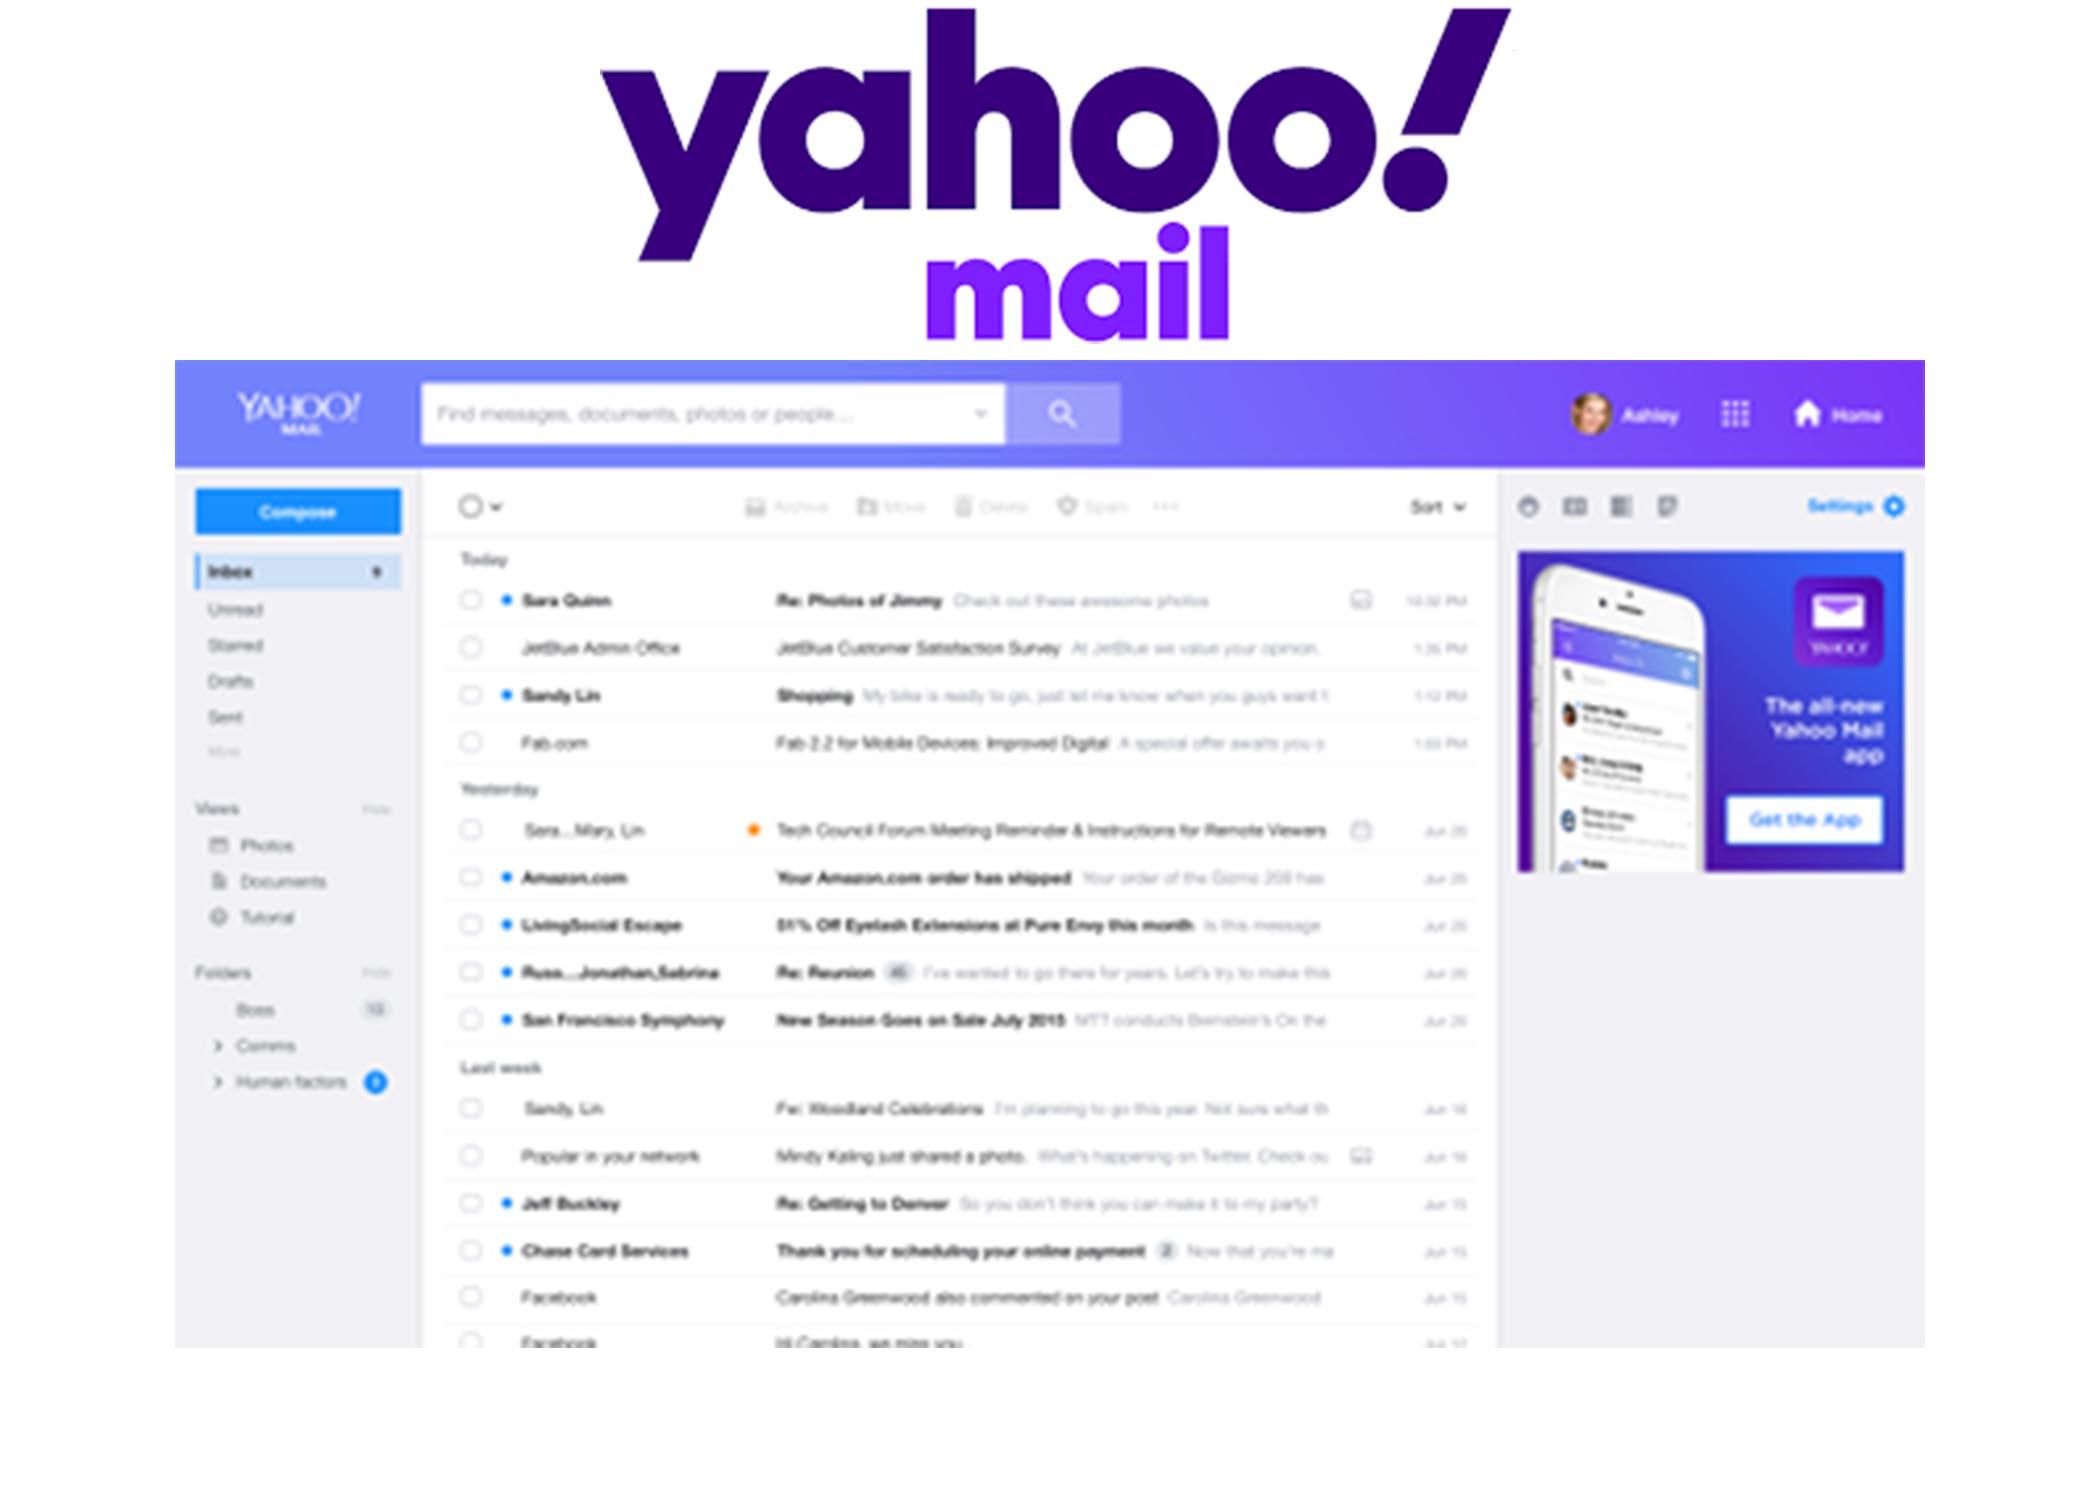 Yahoo Mail - How to Create Yahoo Mail Account | Yahoo Mail Login